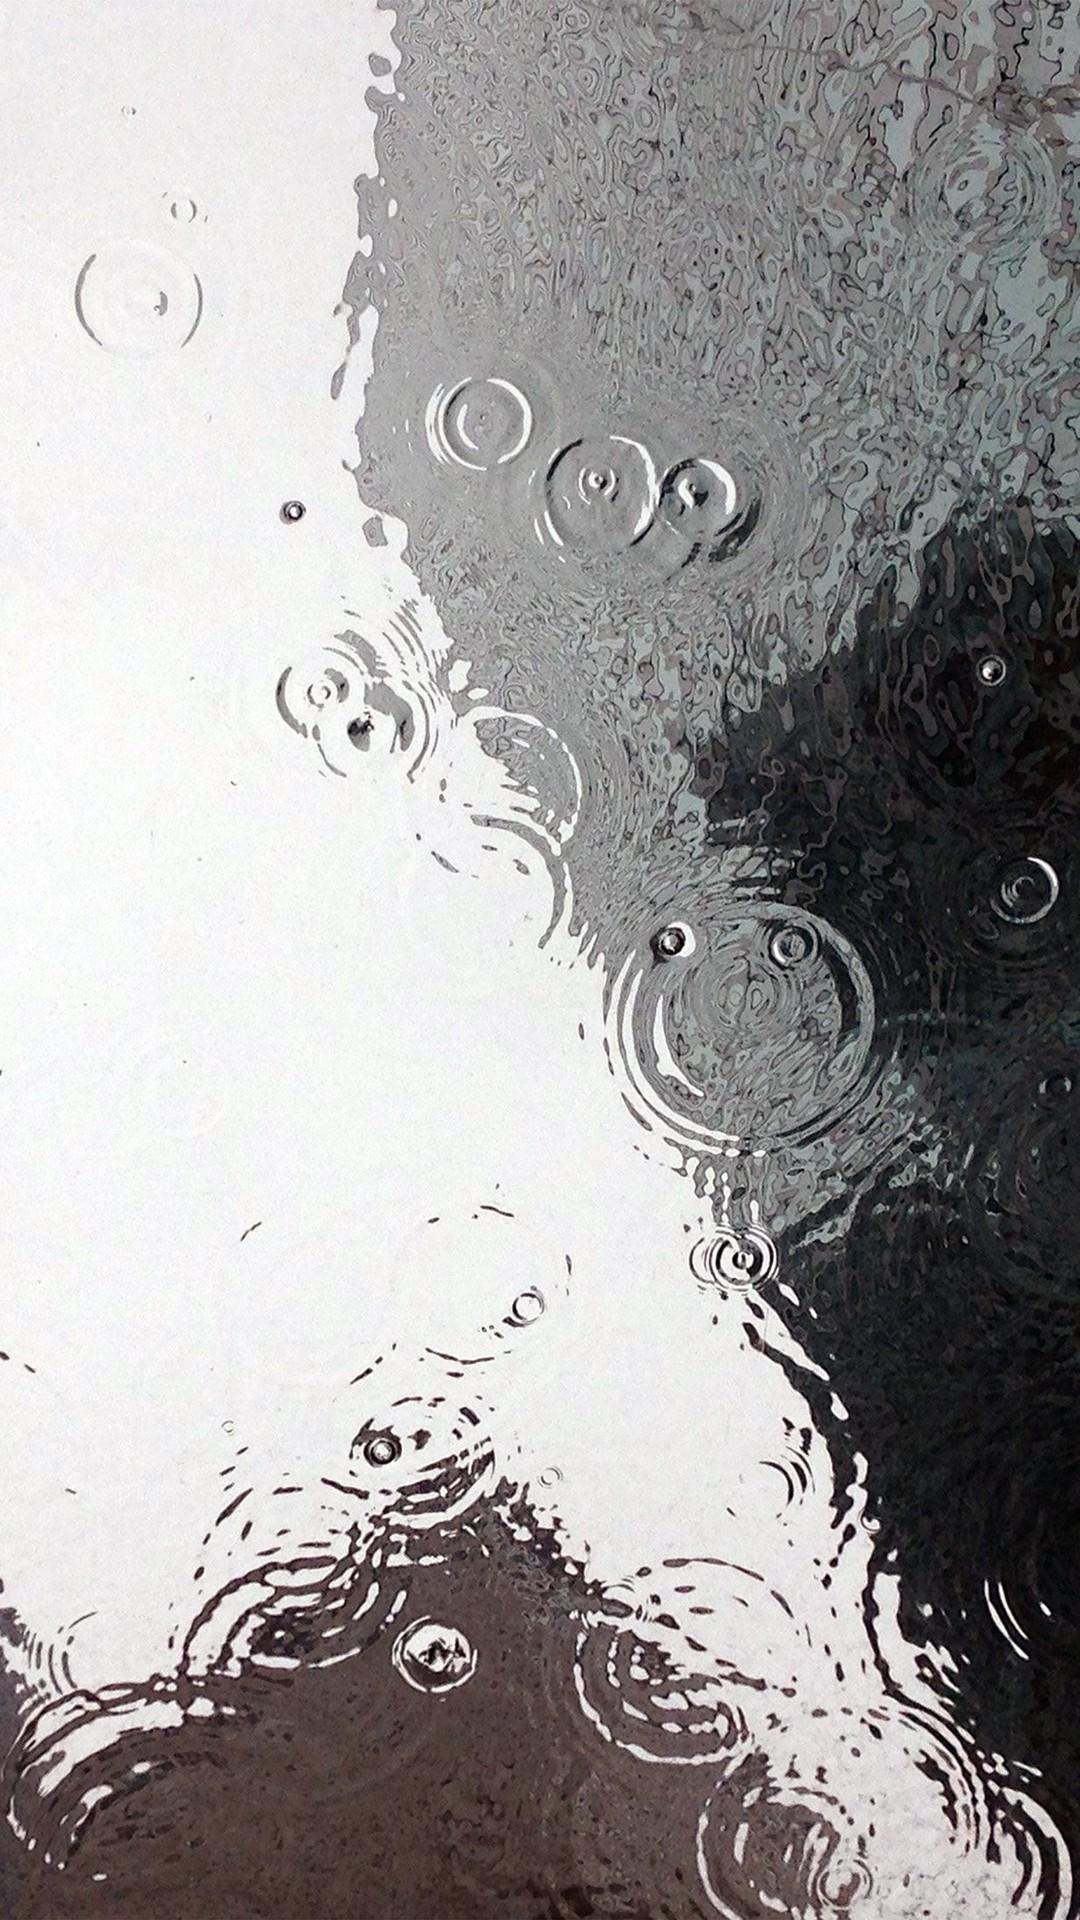 Raindrop Wallpaper 66 Images